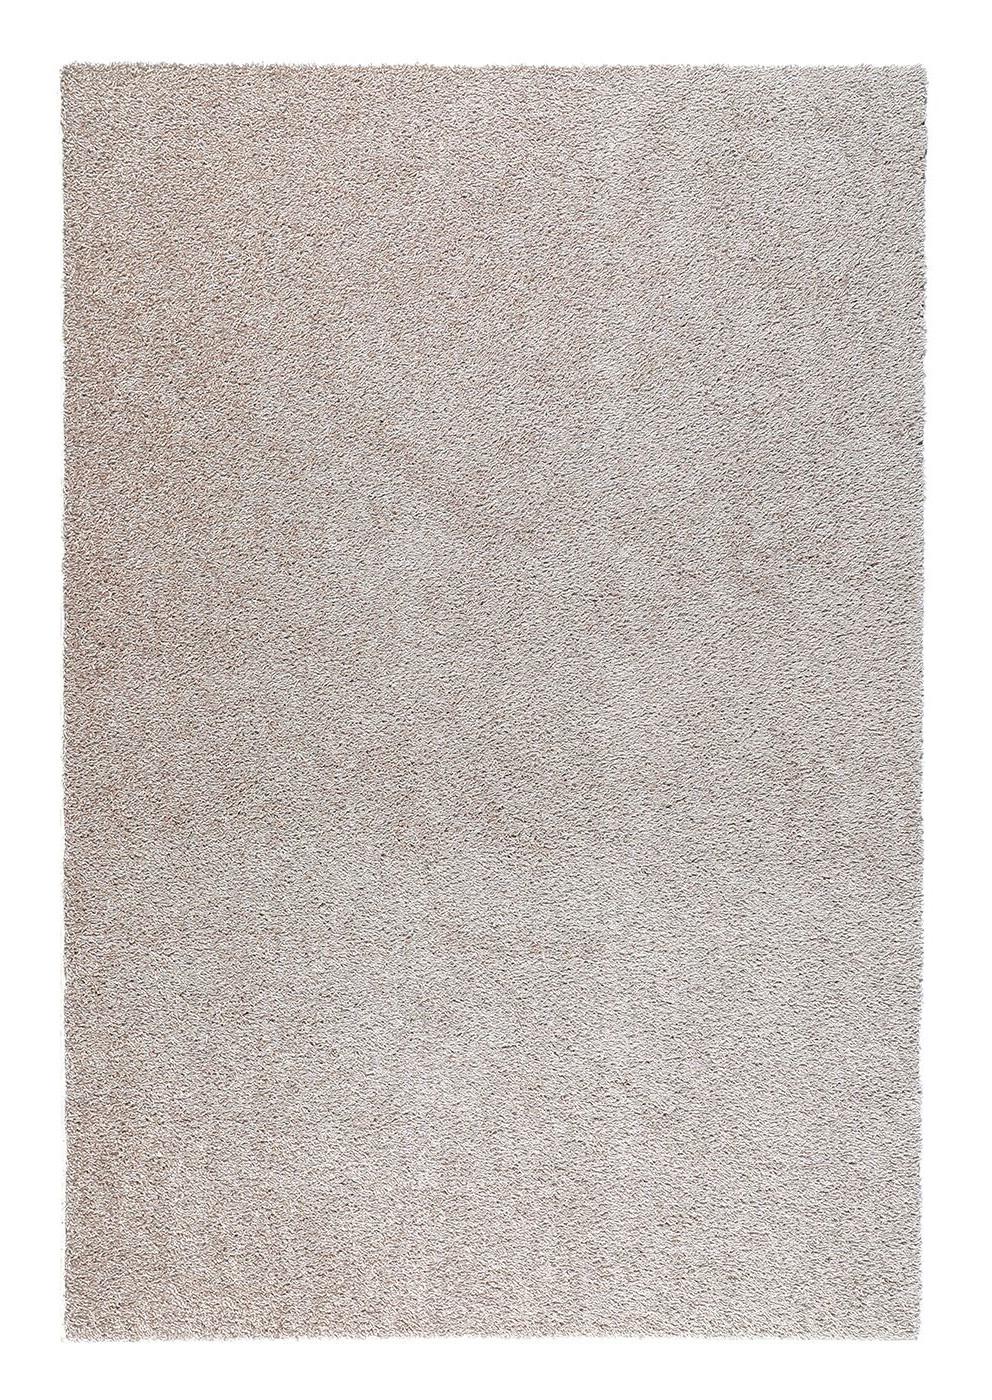 VM Carpet Tessa matto 2191 pellava-beige